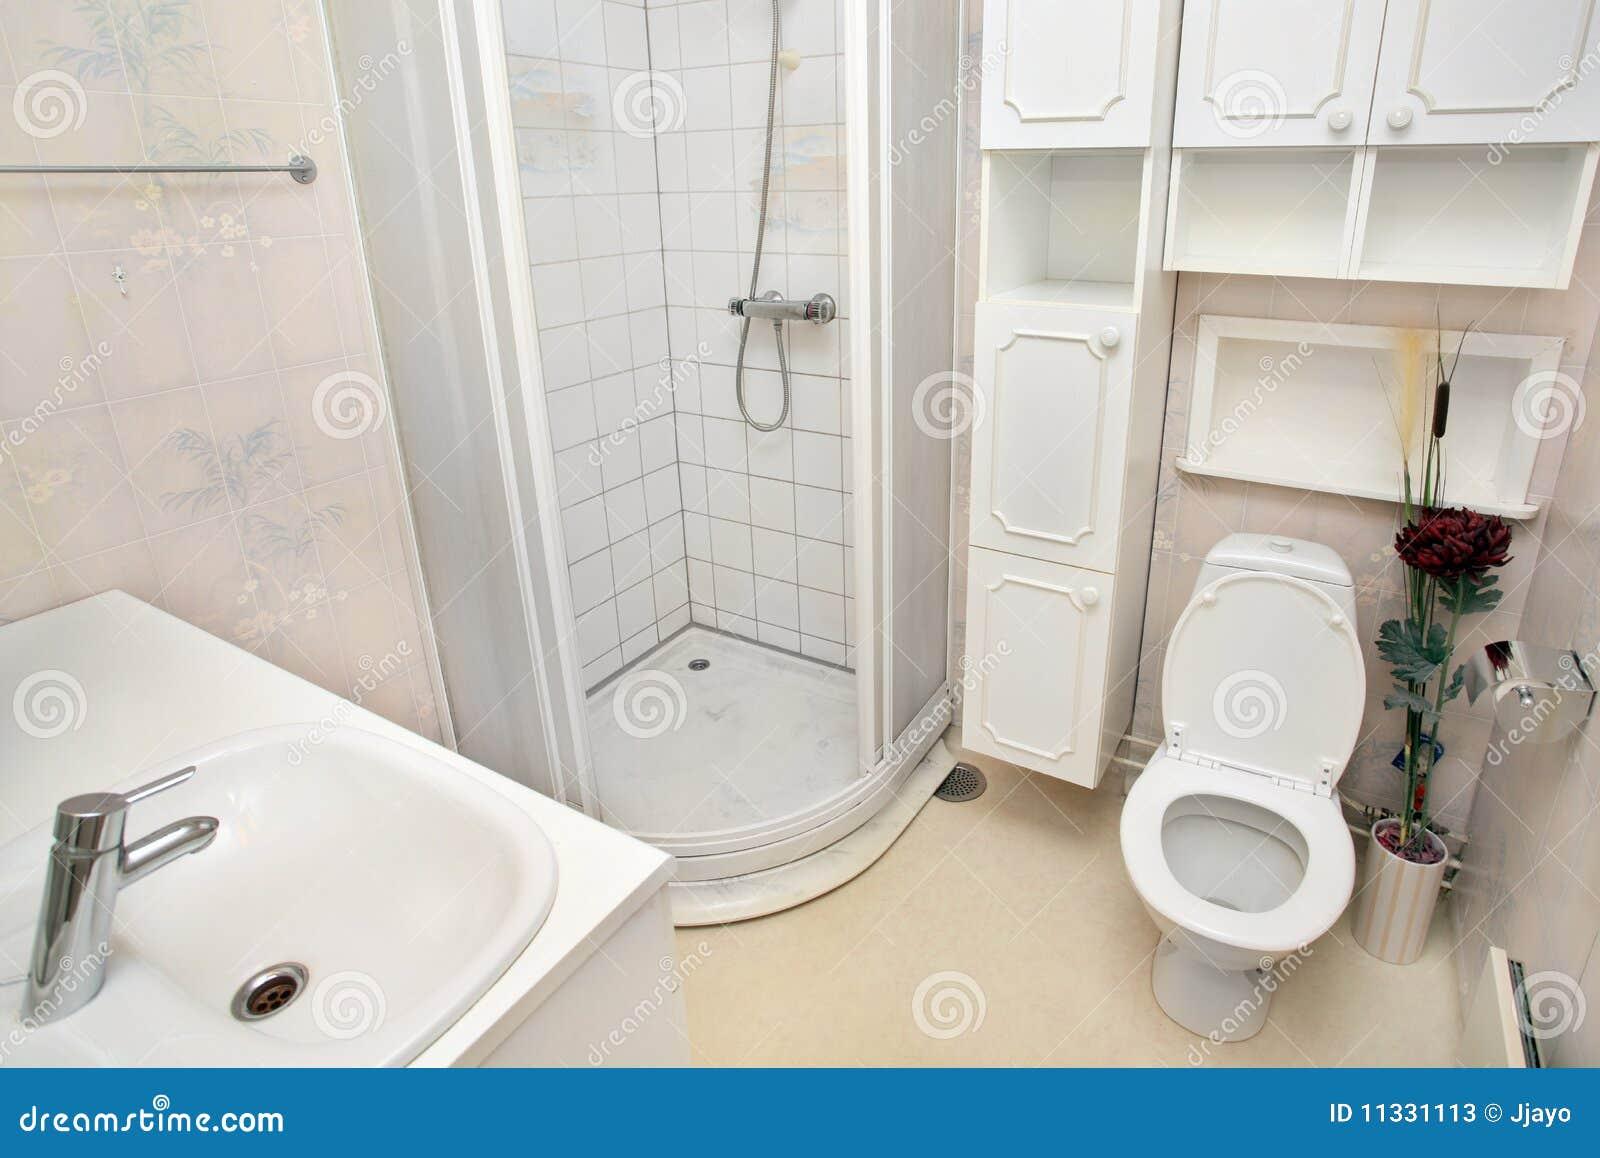 Interior of small white bathroom stock image image of for Small bathroom interior